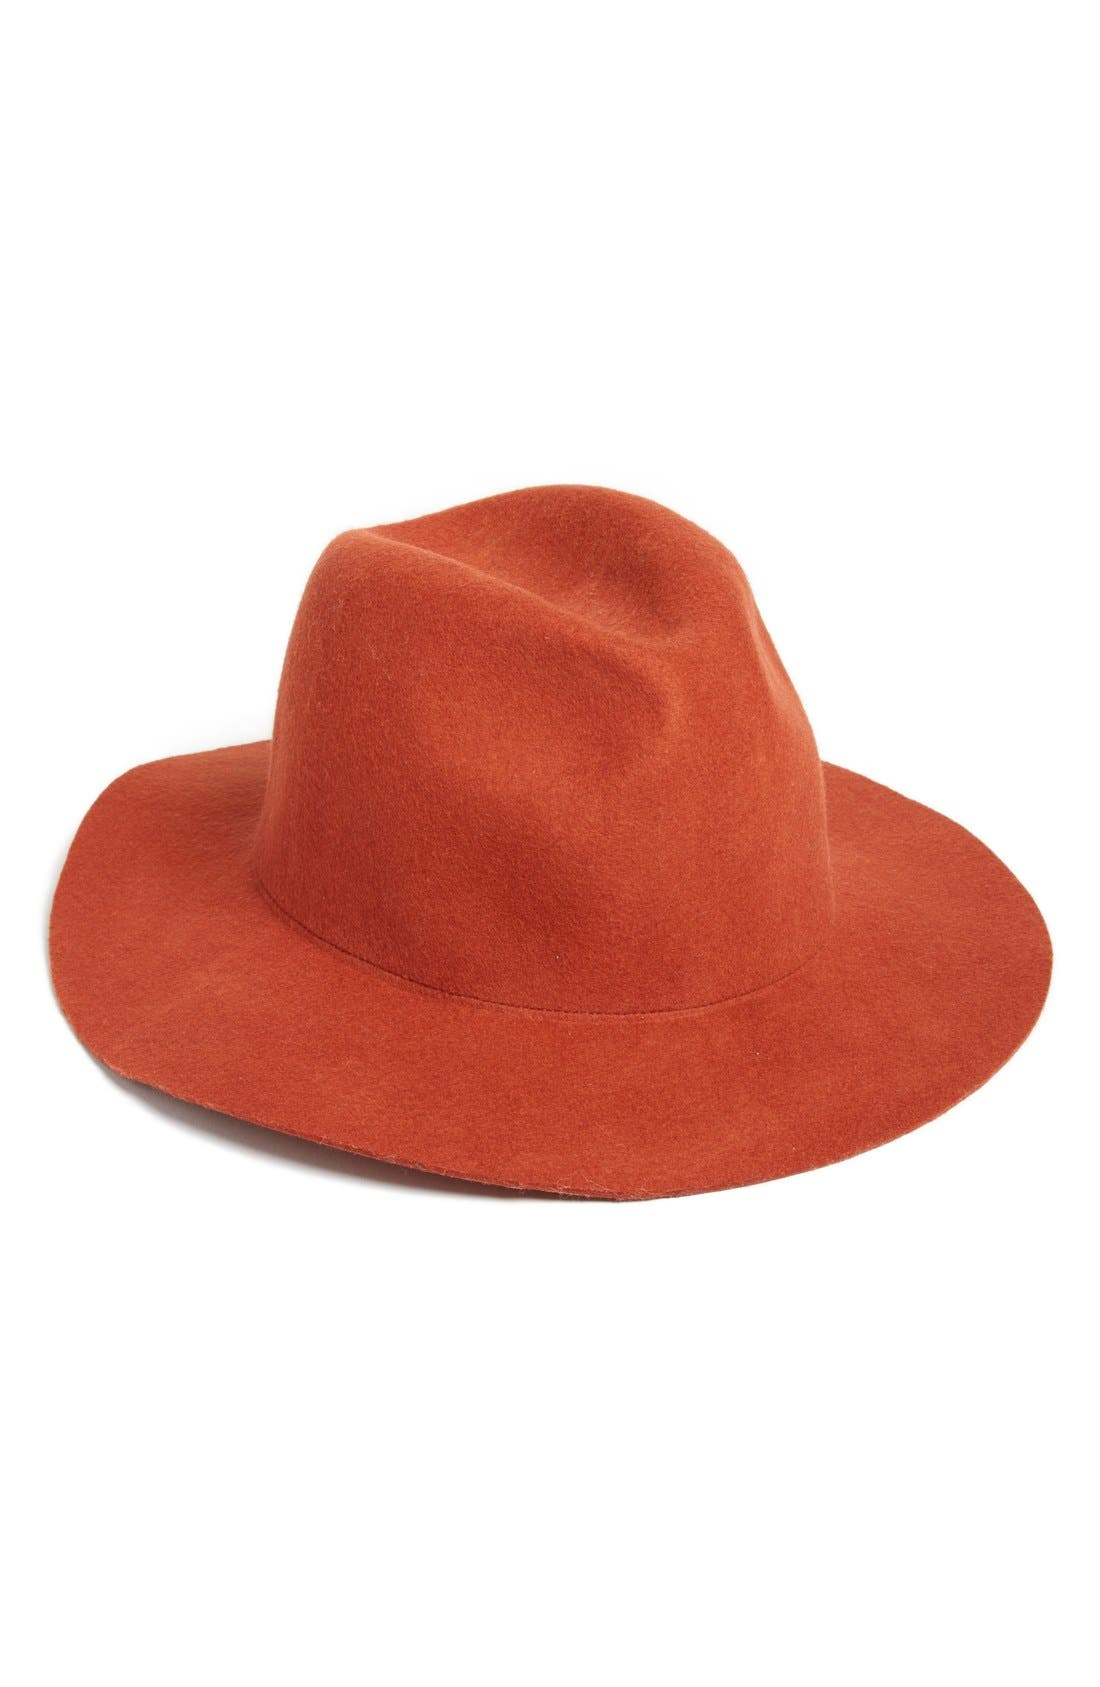 Main Image - Rhythm Wool Hat